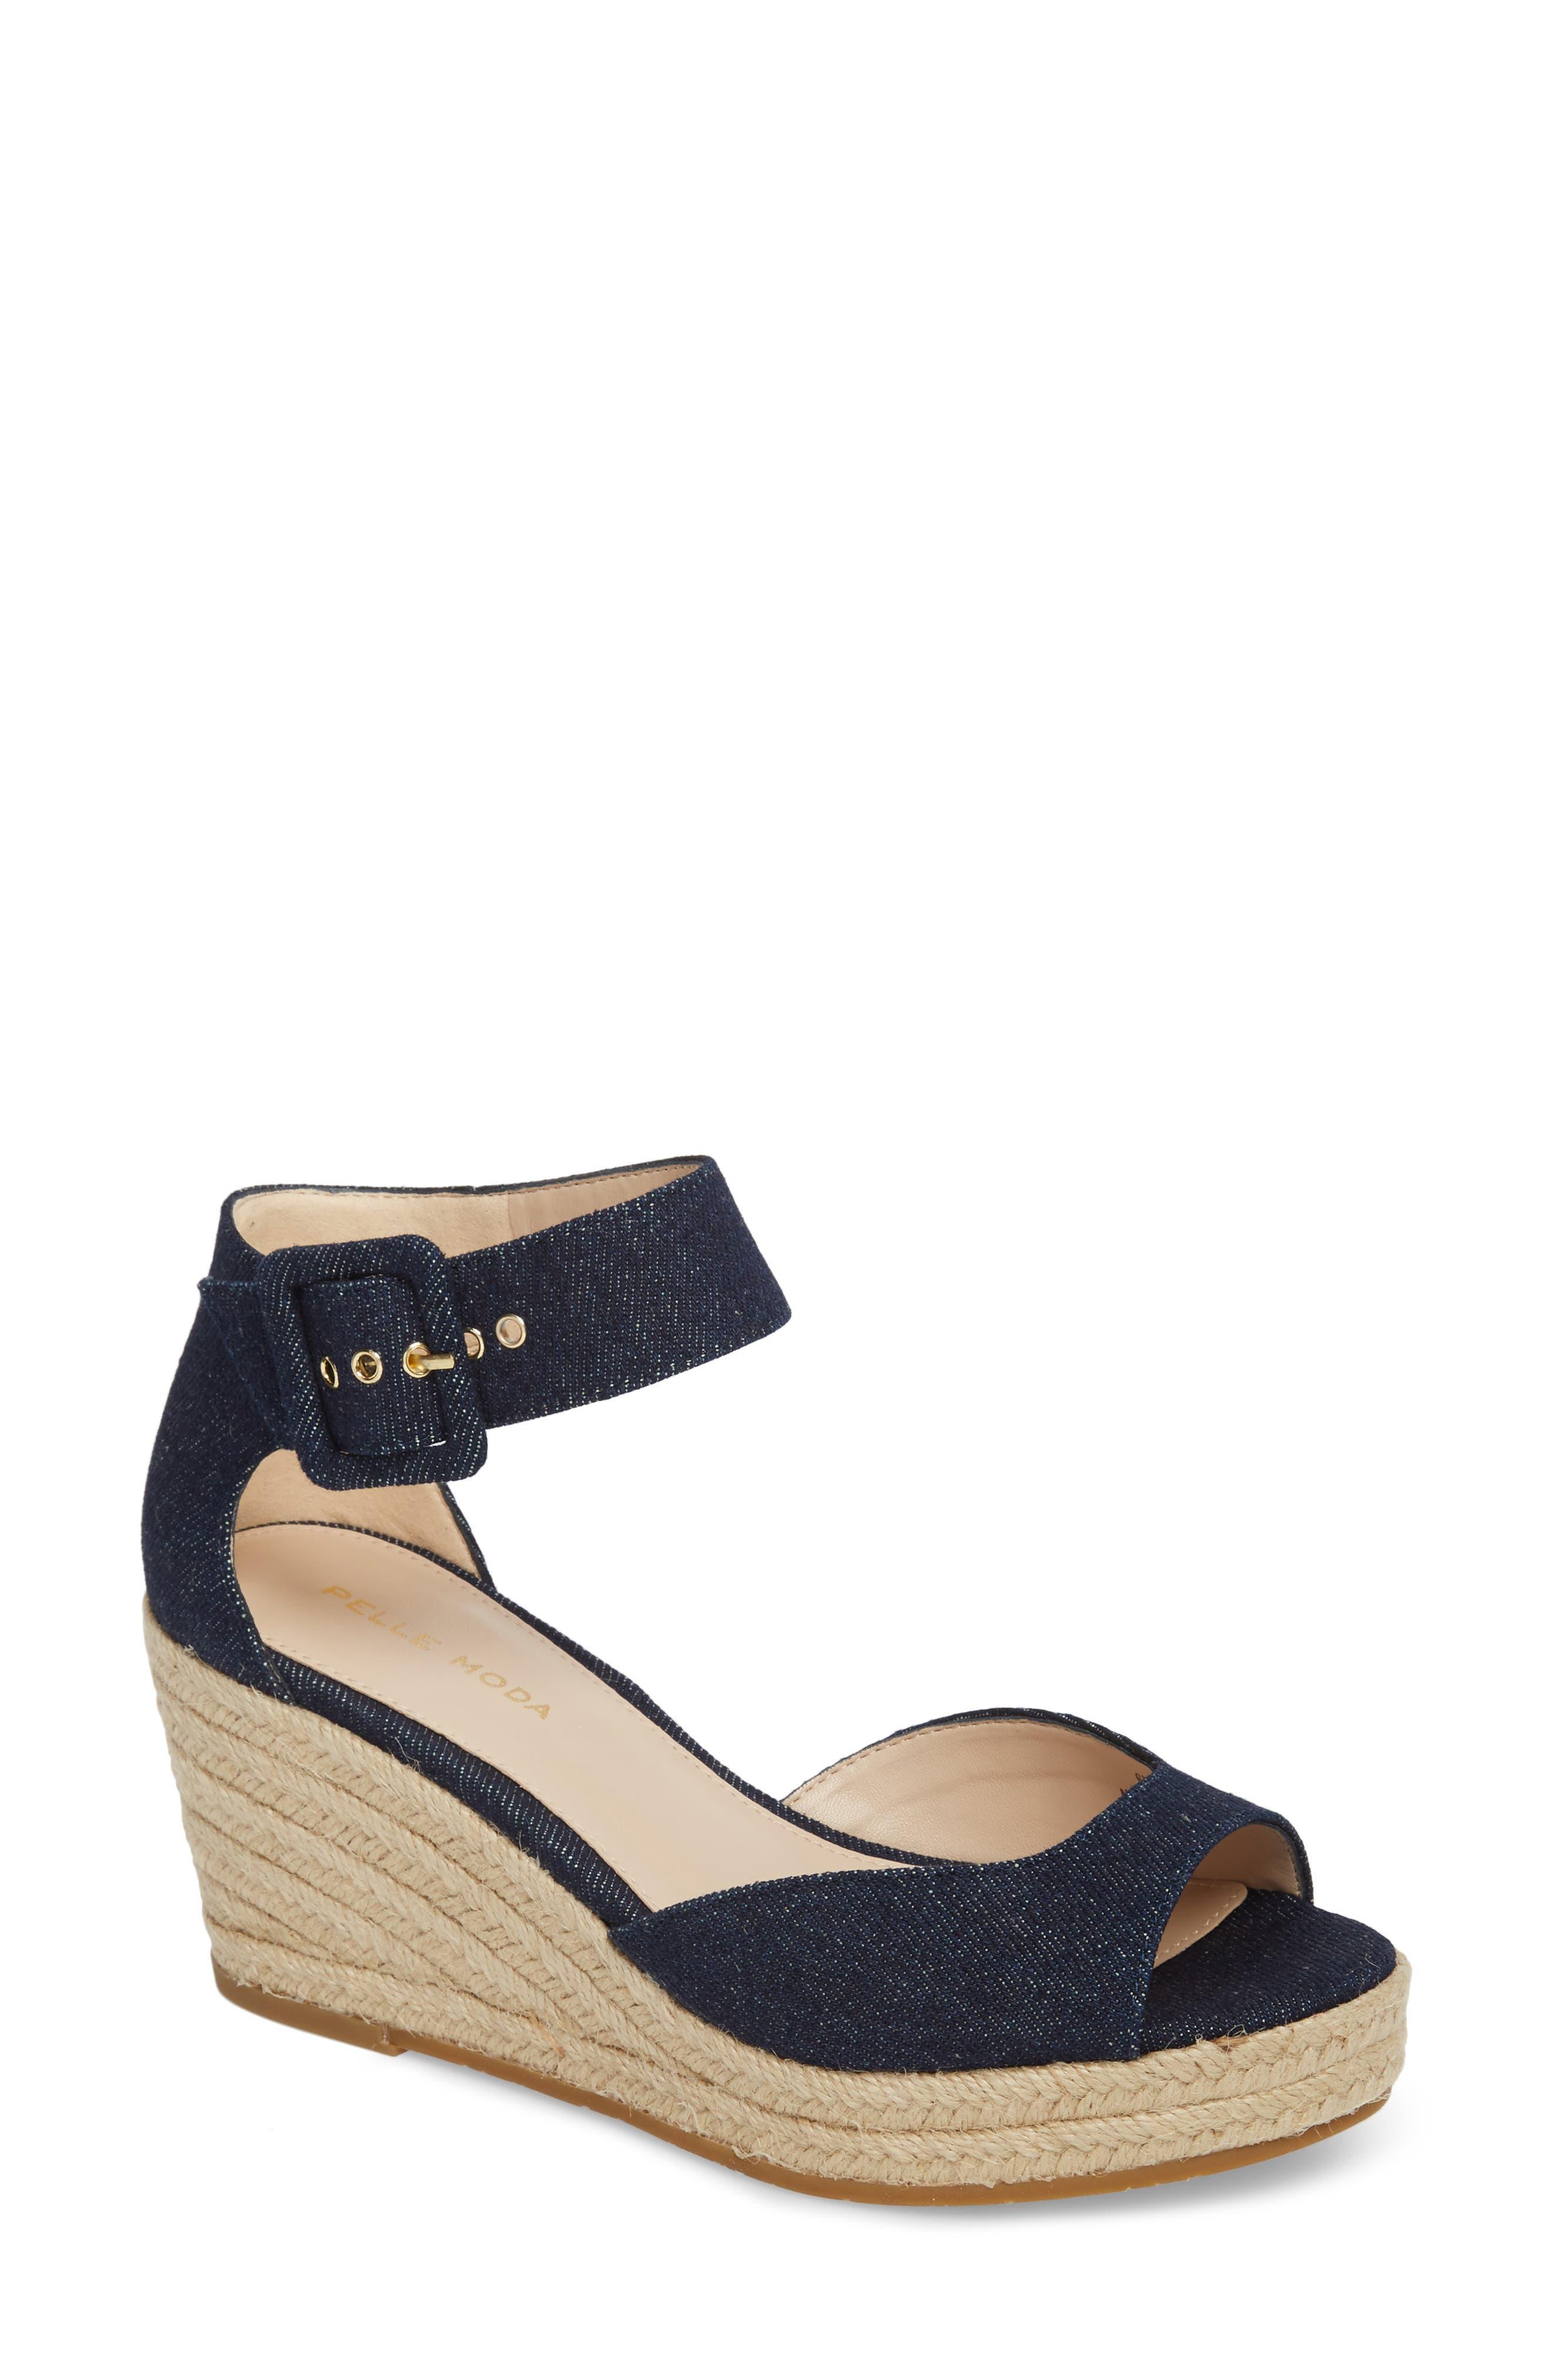 Alternate Image 1 Selected - Pelle Moda Kauai Platform Wedge Sandal (Women)